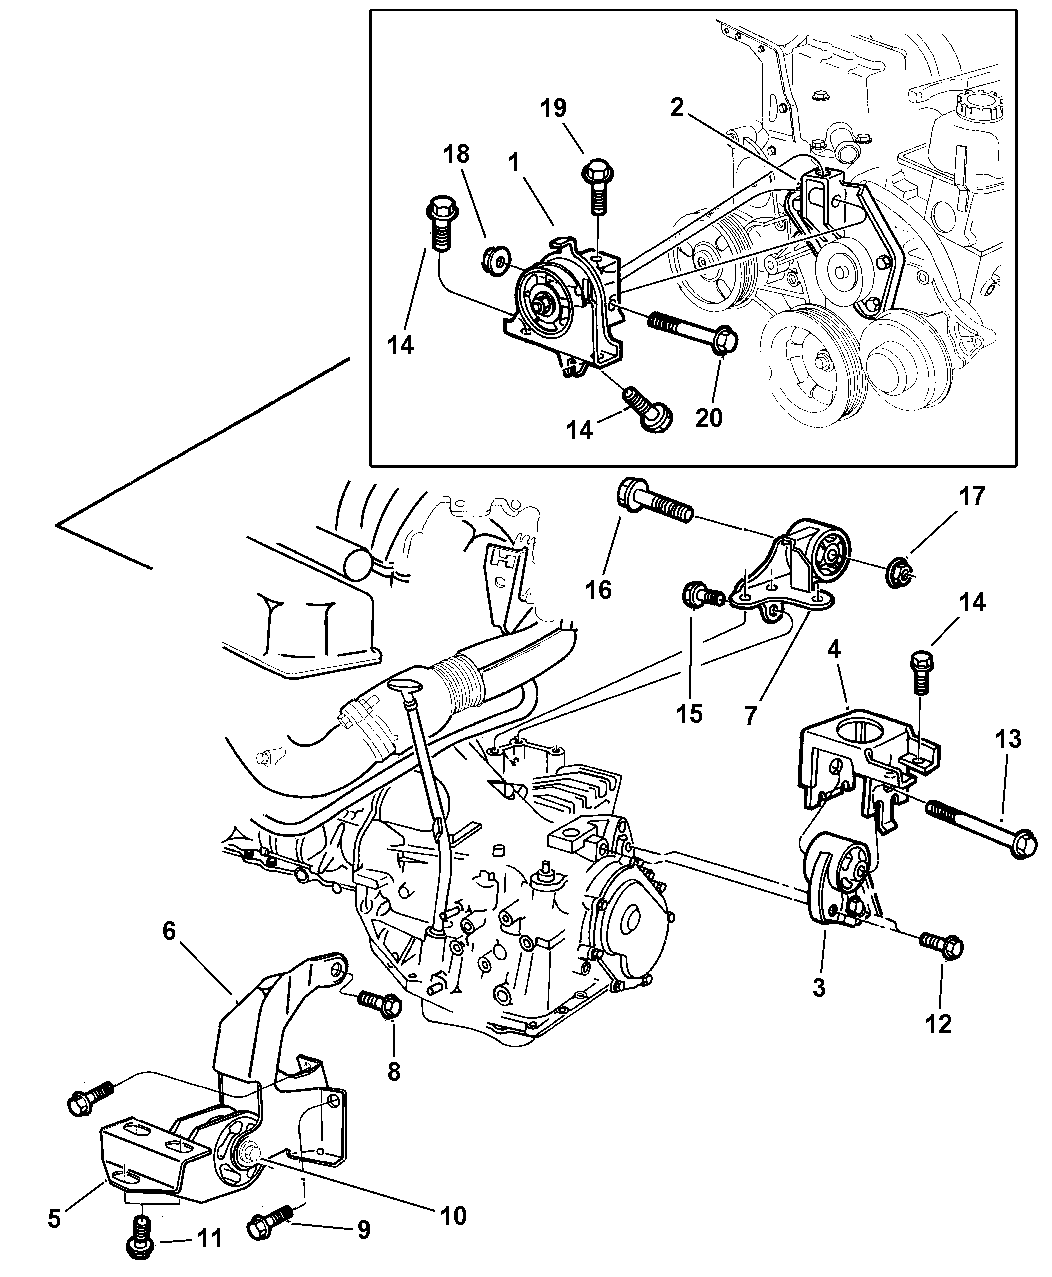 1997 dodge grand caravan engine mounts - thumbnail 1